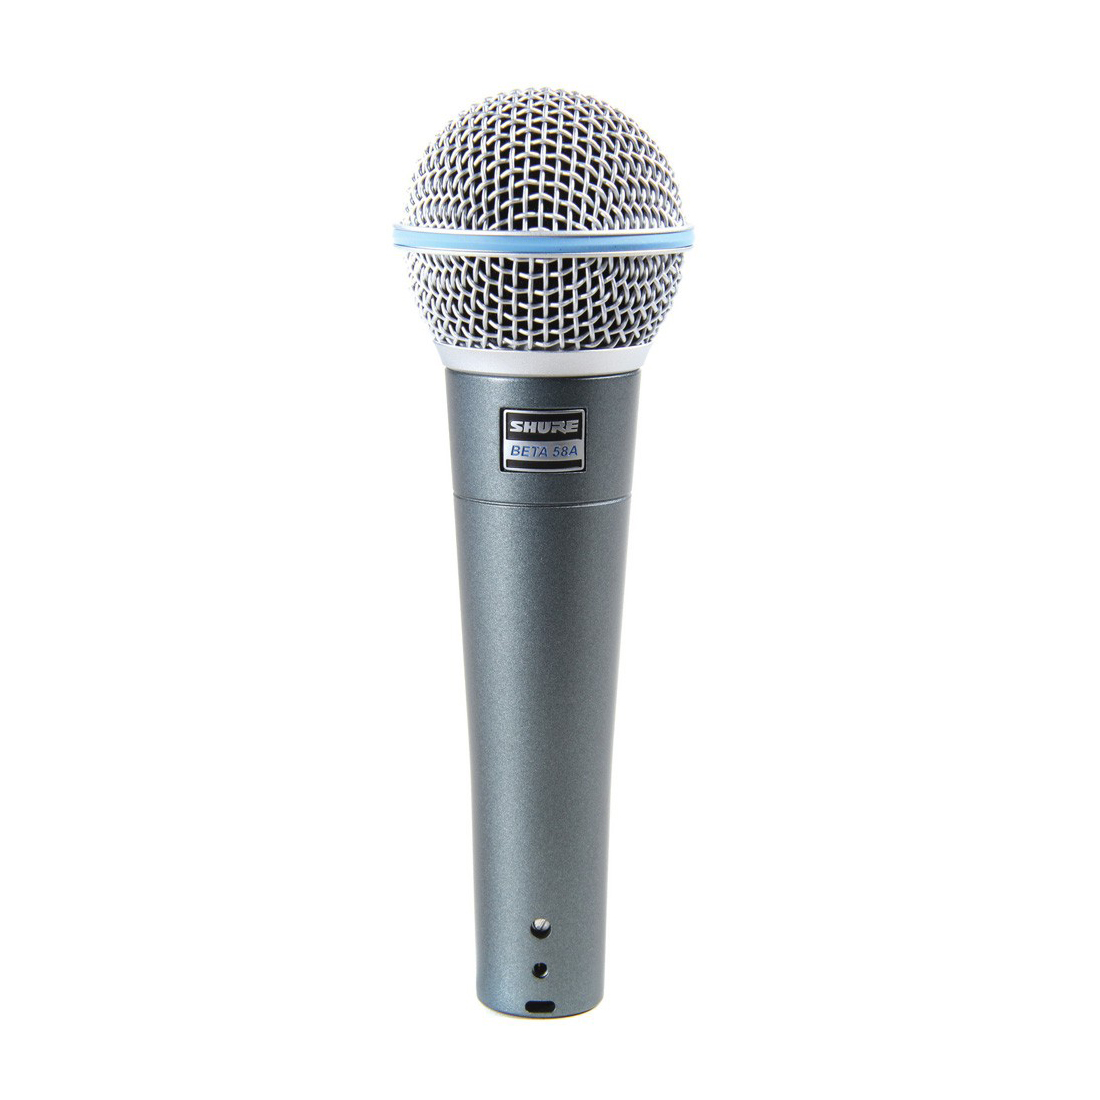 Afbeelding van Shure BETA 58A zangmicrofoon dynamisch